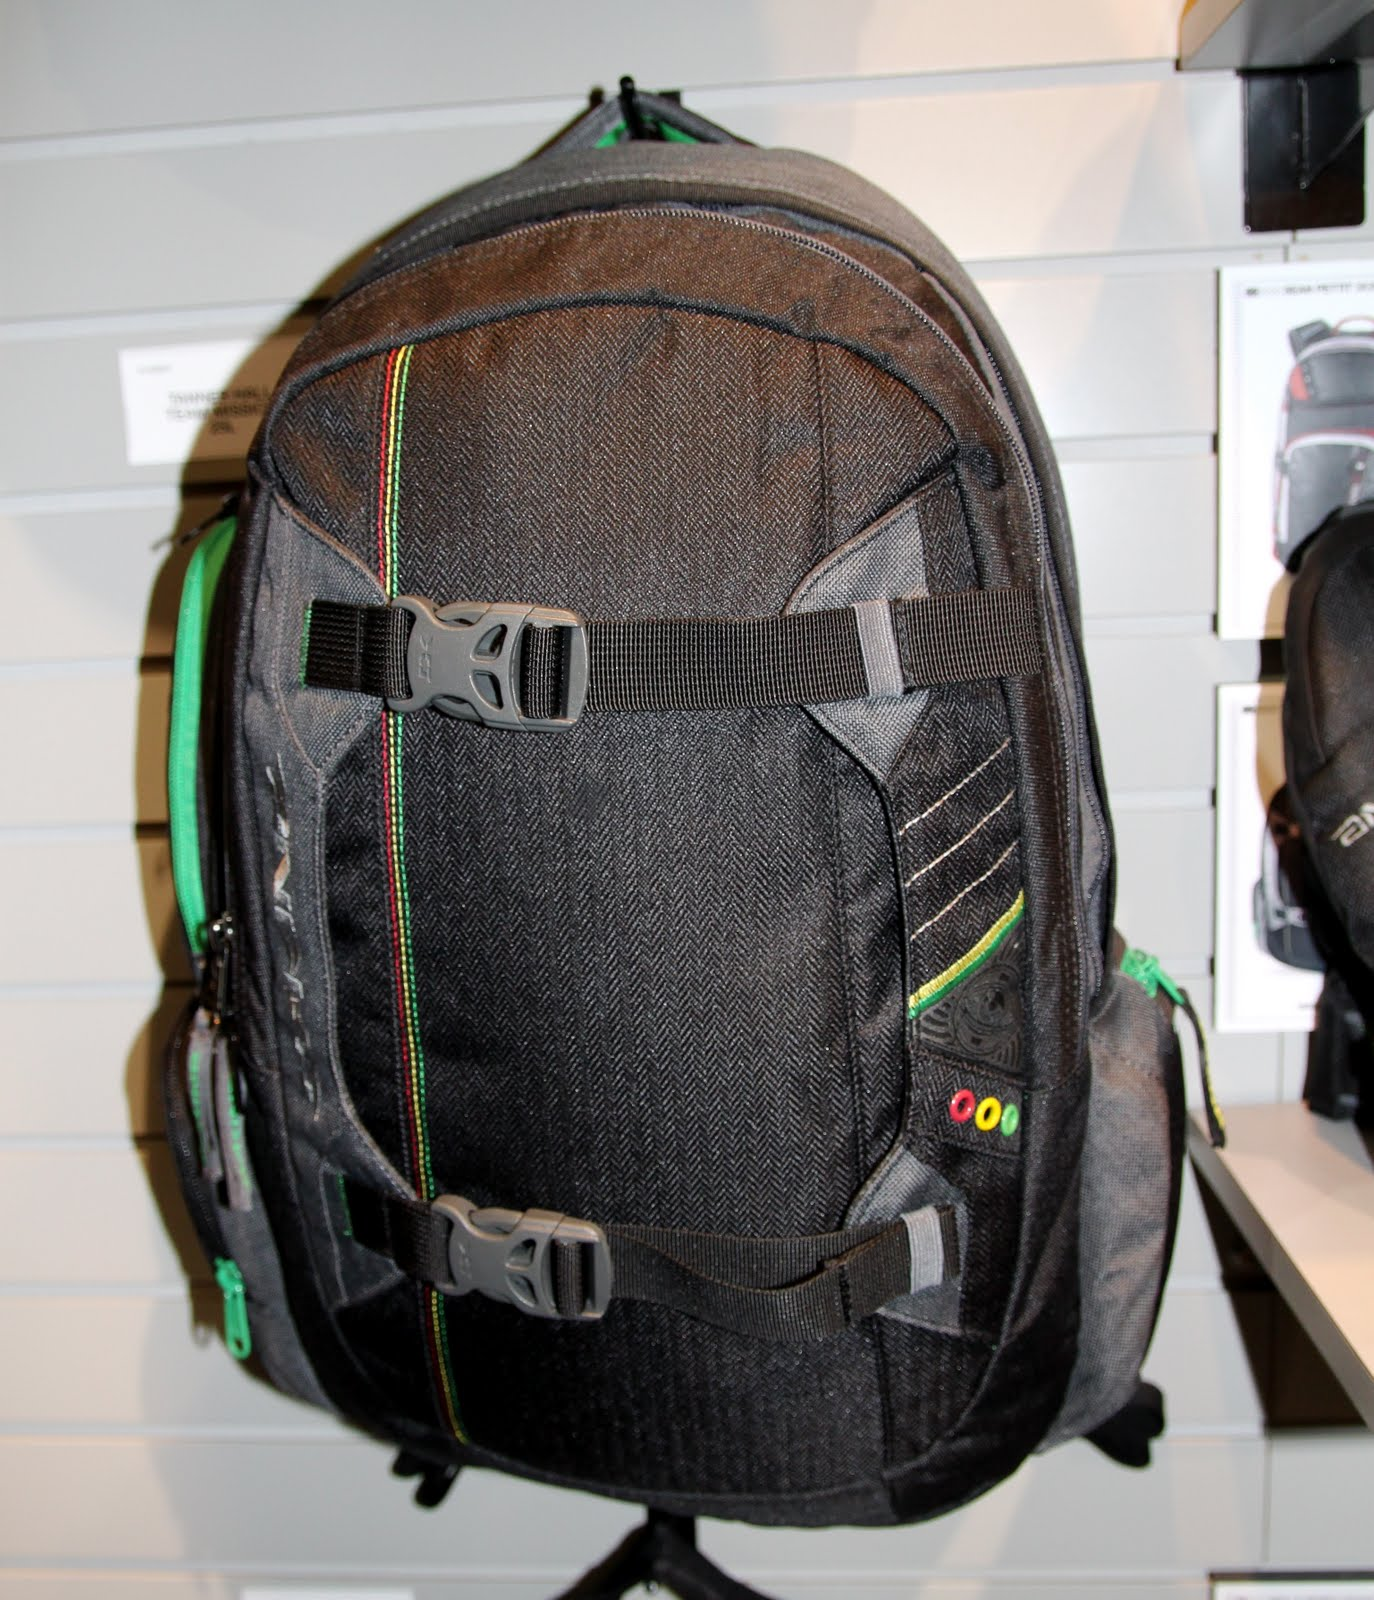 Dakine 2011 F W Snow Gloves Mittens Packs Luggage Bags